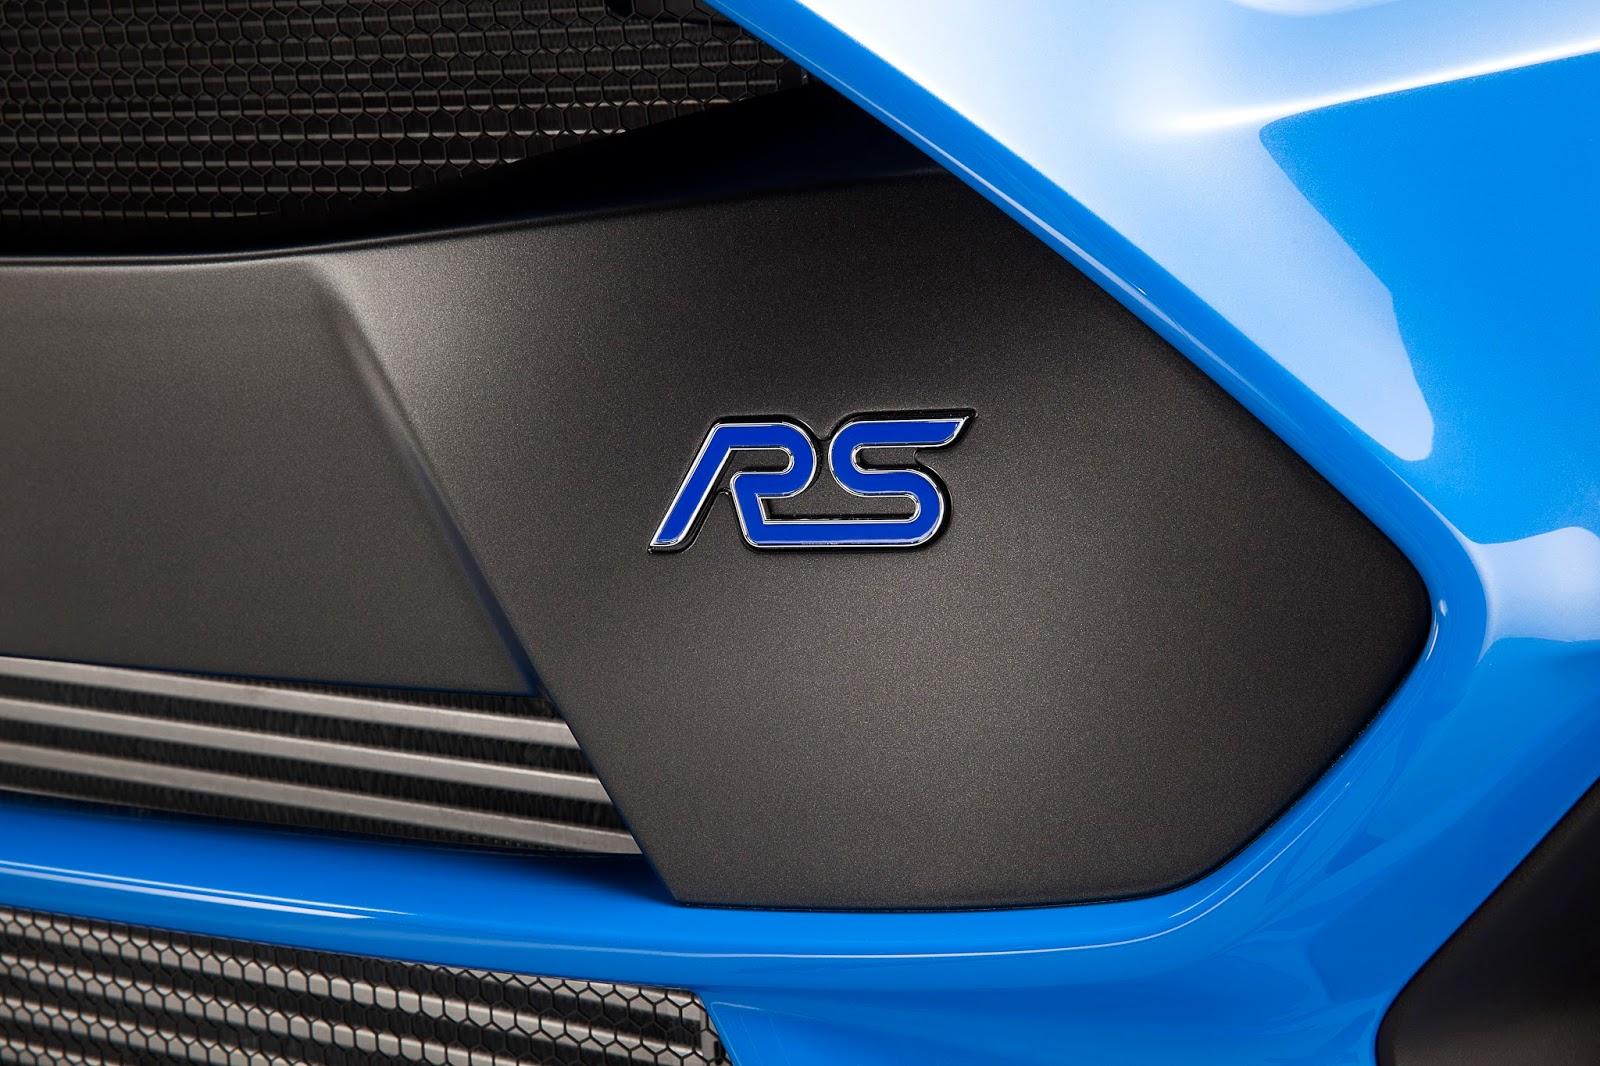 16FordFocusRS 10 HR Ford Focus RS Option Pack Edition : Το τέλειο βελτιώθηκε! Ford, Ford Focus, Ford Focus RS, Ford Focus RS Option Pack Edition, Ford Performance, Limited edition, videos